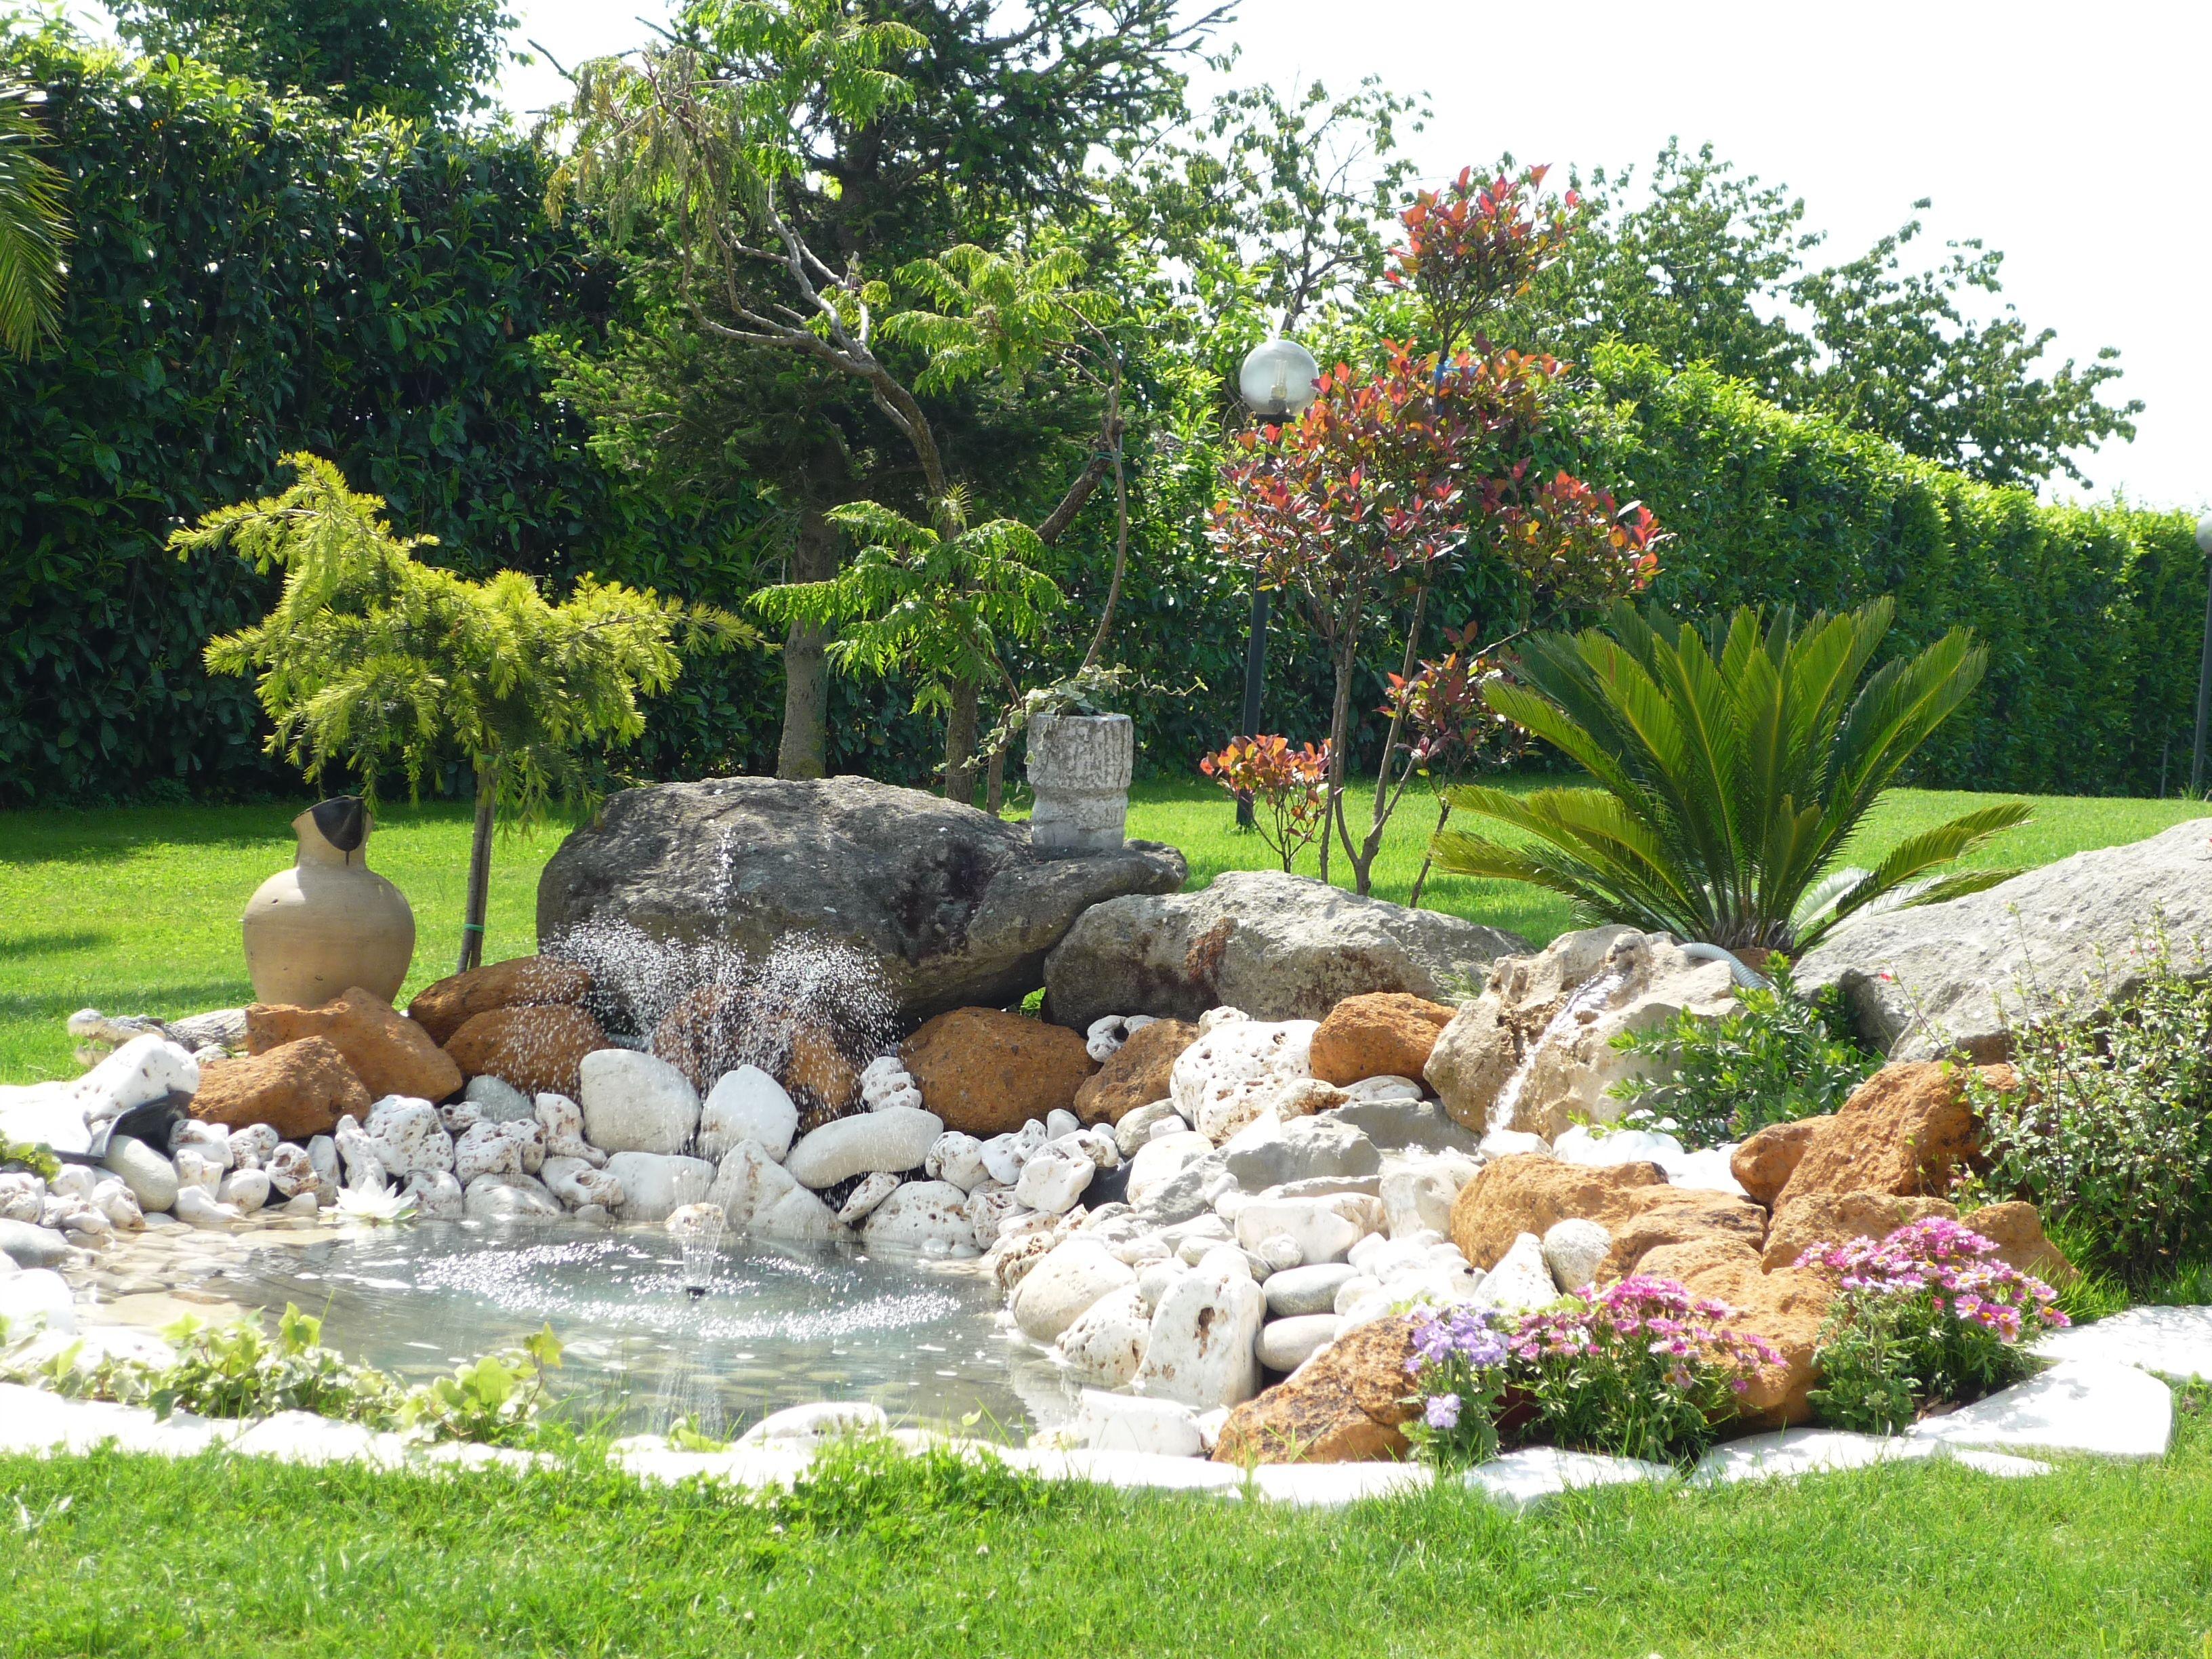 une petite oasis dans le jardin 20 id es splendides tutoriel le jardin cr er et jardins. Black Bedroom Furniture Sets. Home Design Ideas